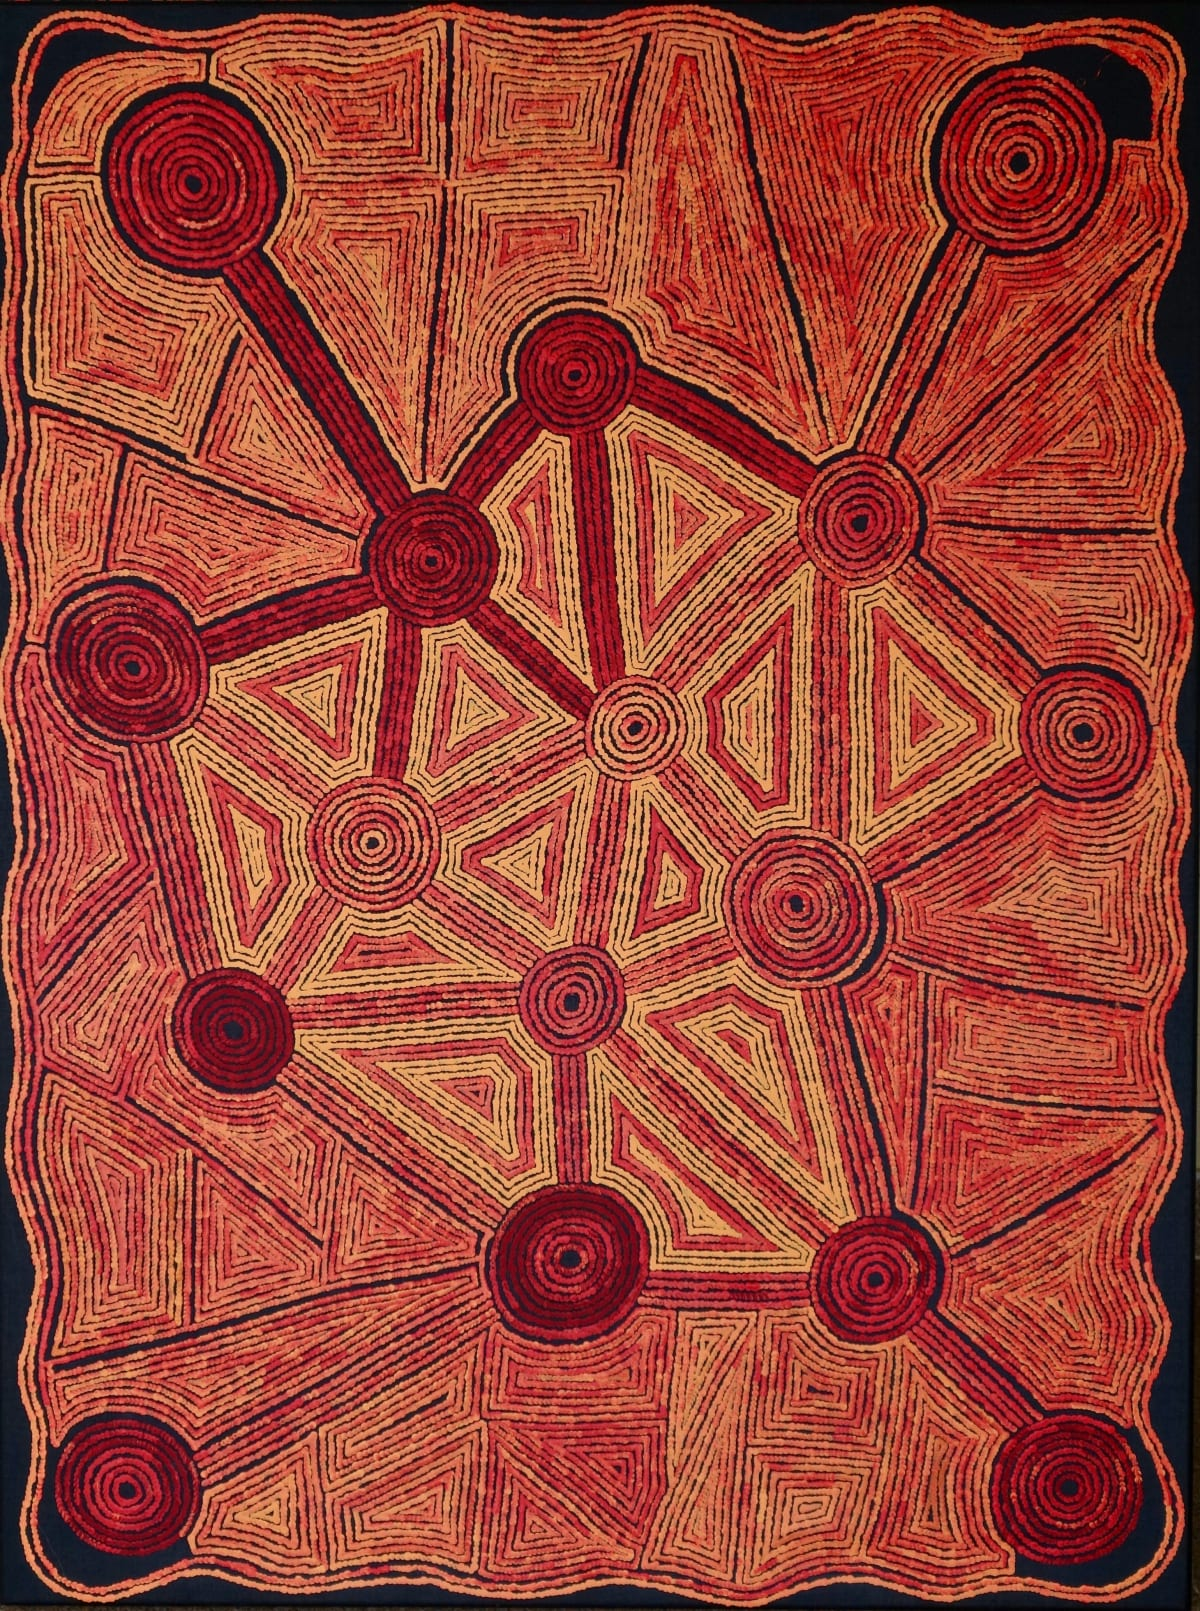 Alison Anderson Geometry acrylic on linen 122 x 92 cm